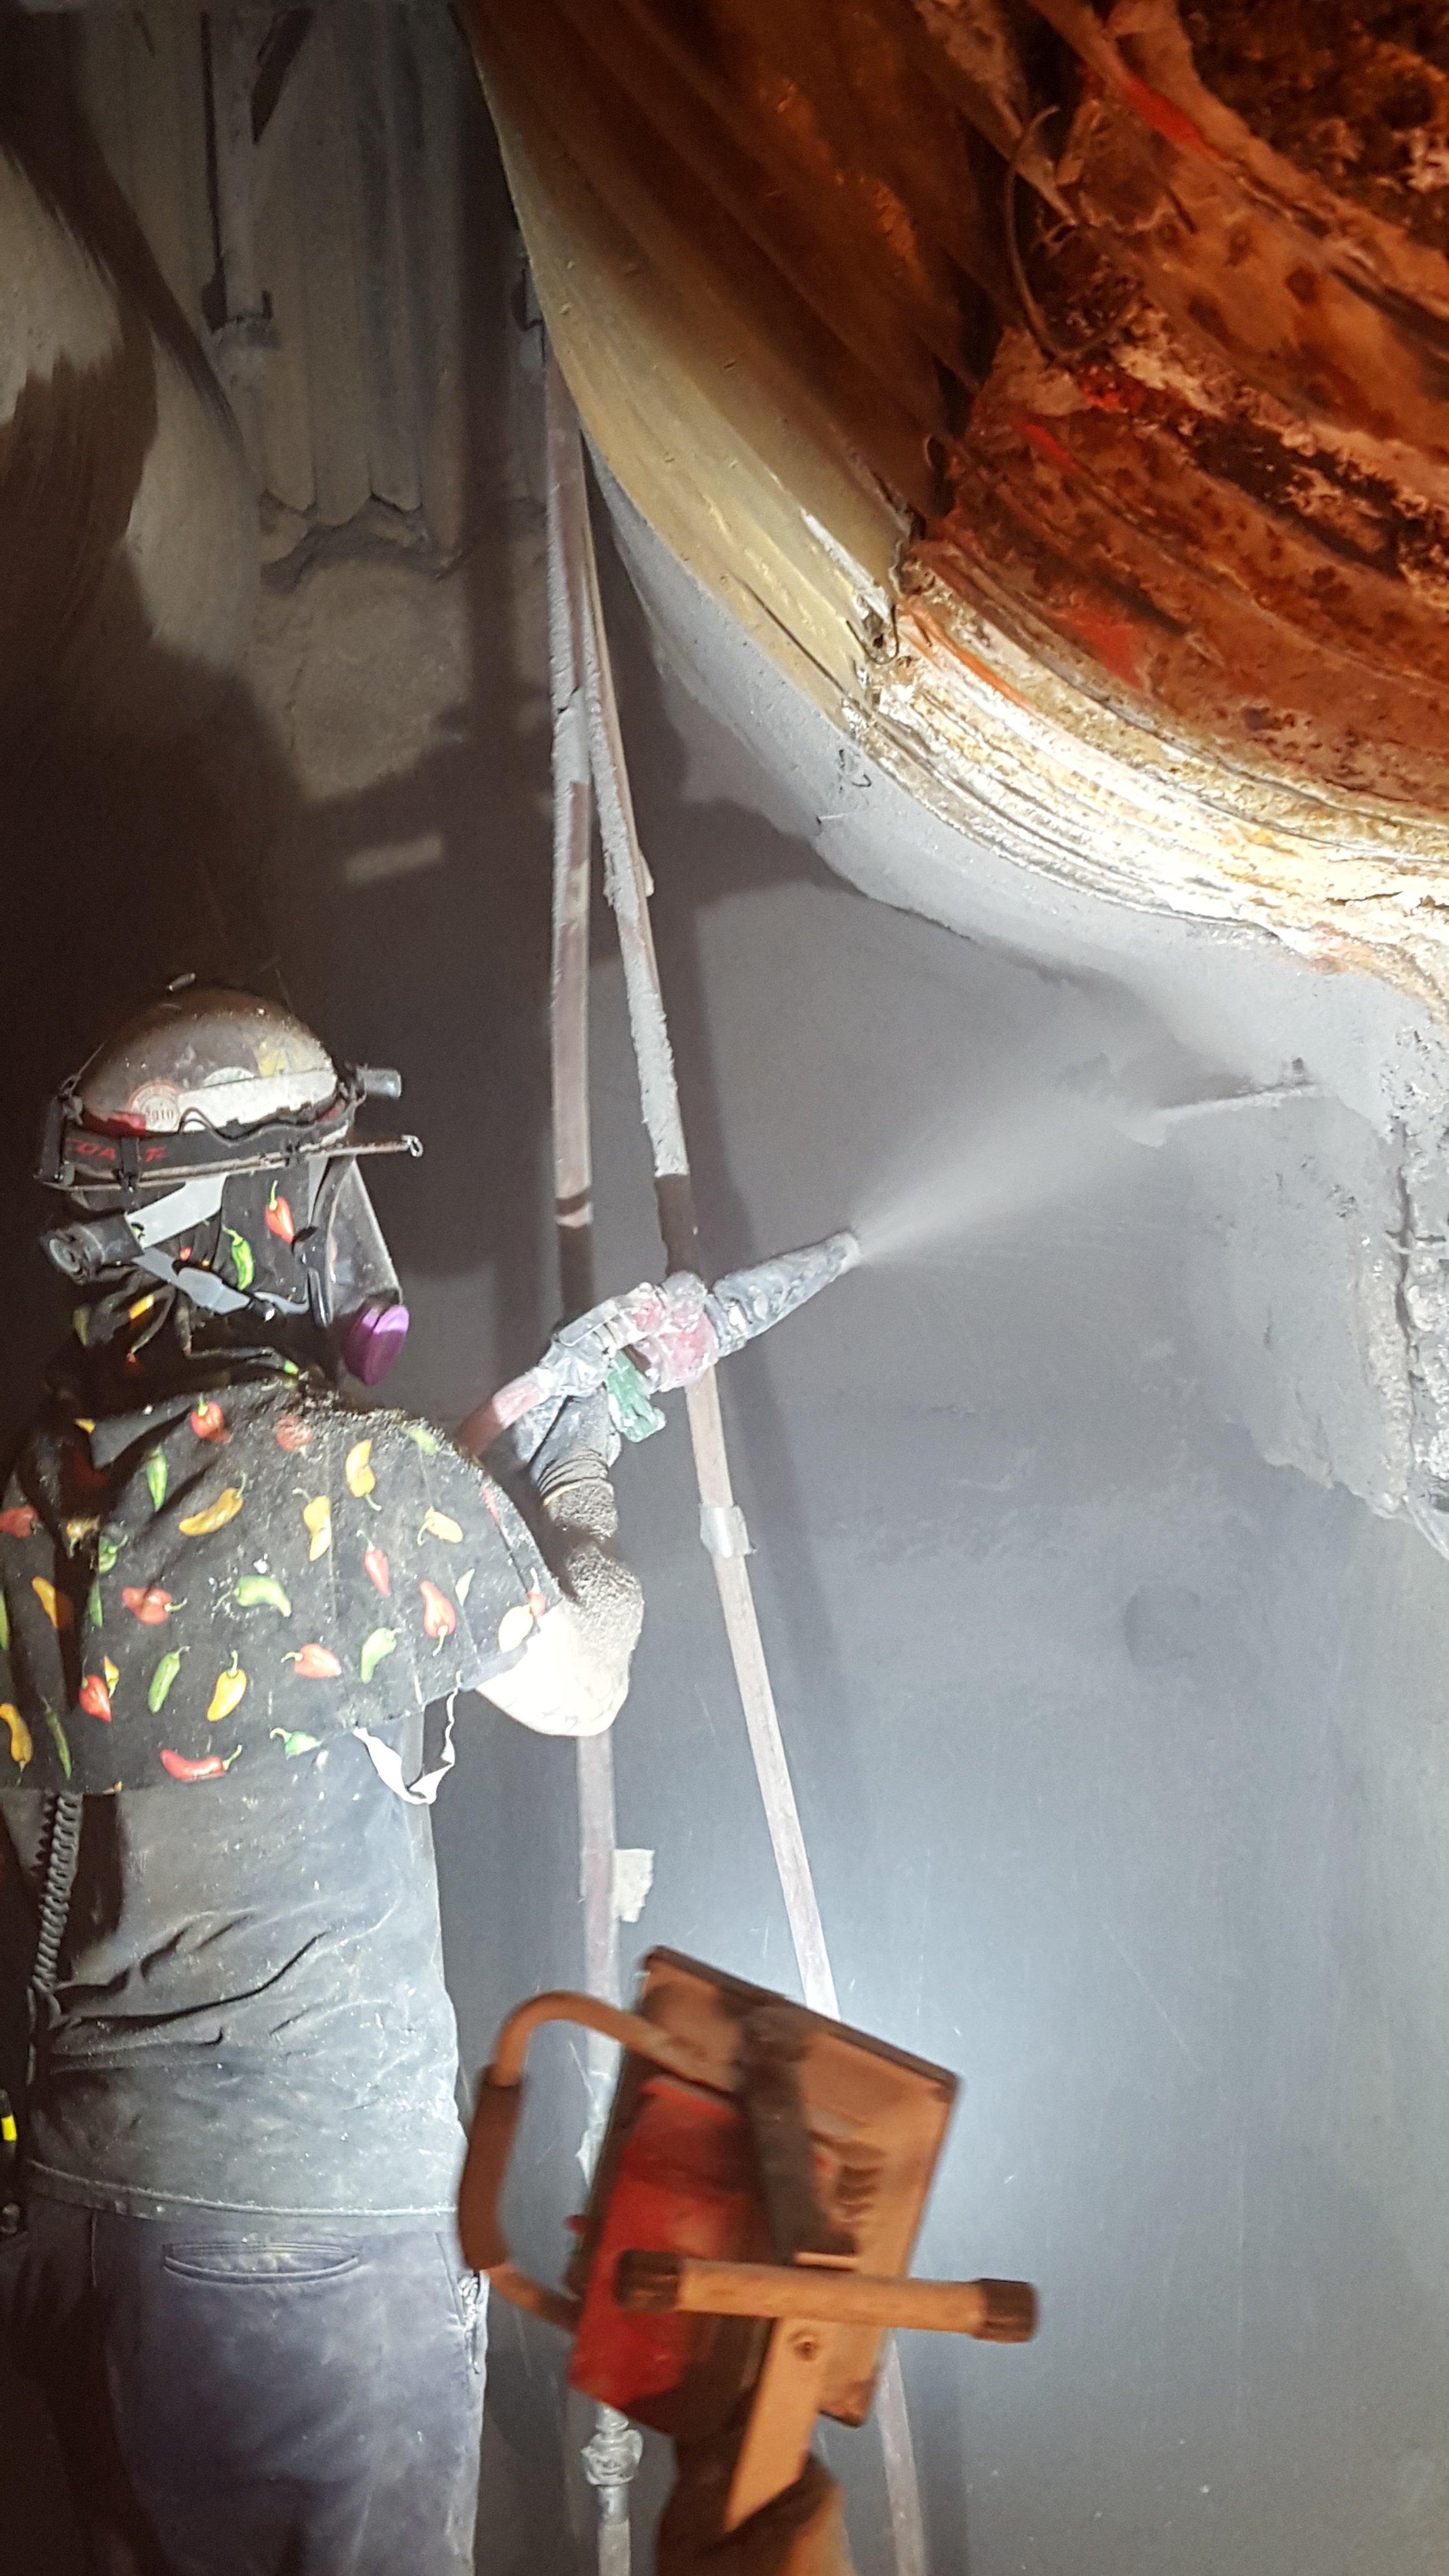 Wet Bottom Ash Hopper Shotcrete Repair - Coal Fired Power Plant